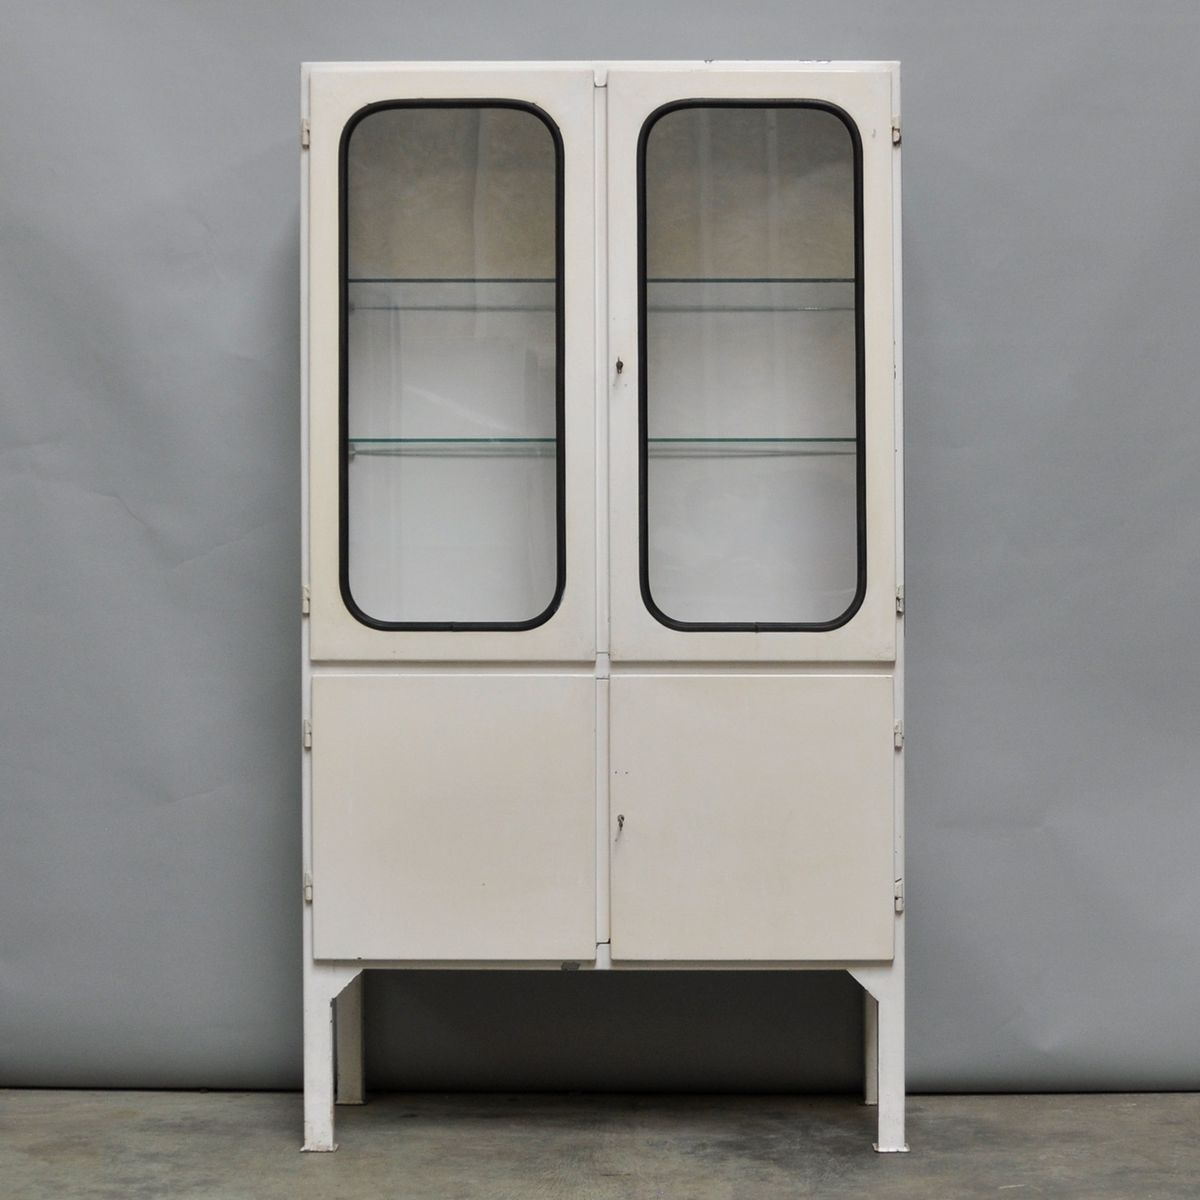 meuble de rangement m dical vintage en verre et fer. Black Bedroom Furniture Sets. Home Design Ideas